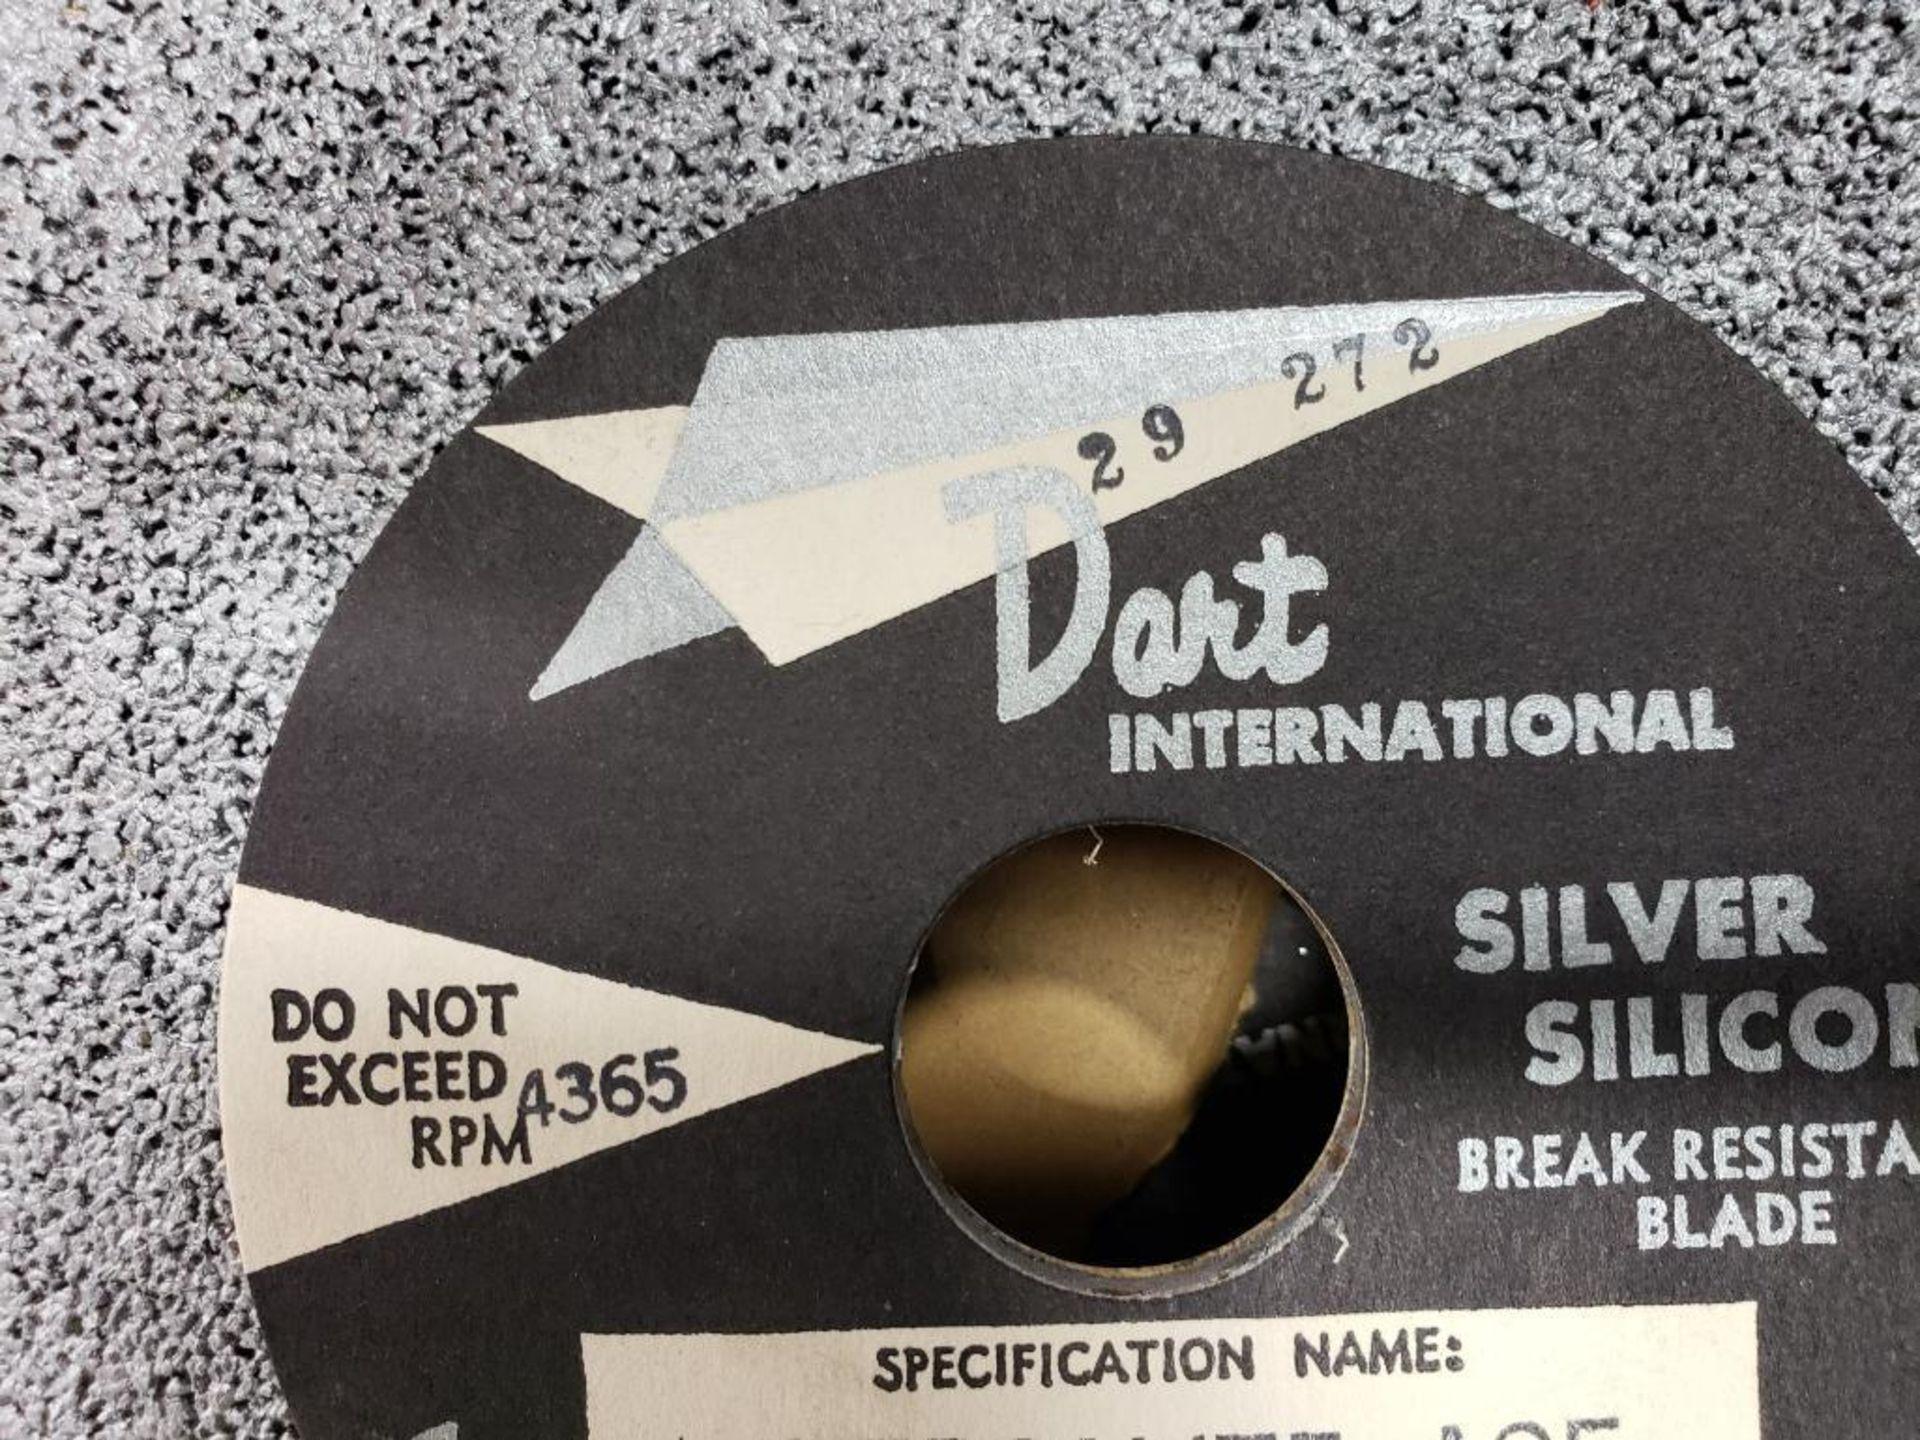 Dart International Silver Silicon break resistant grinding wheels. Versalite Ace. - Image 2 of 4